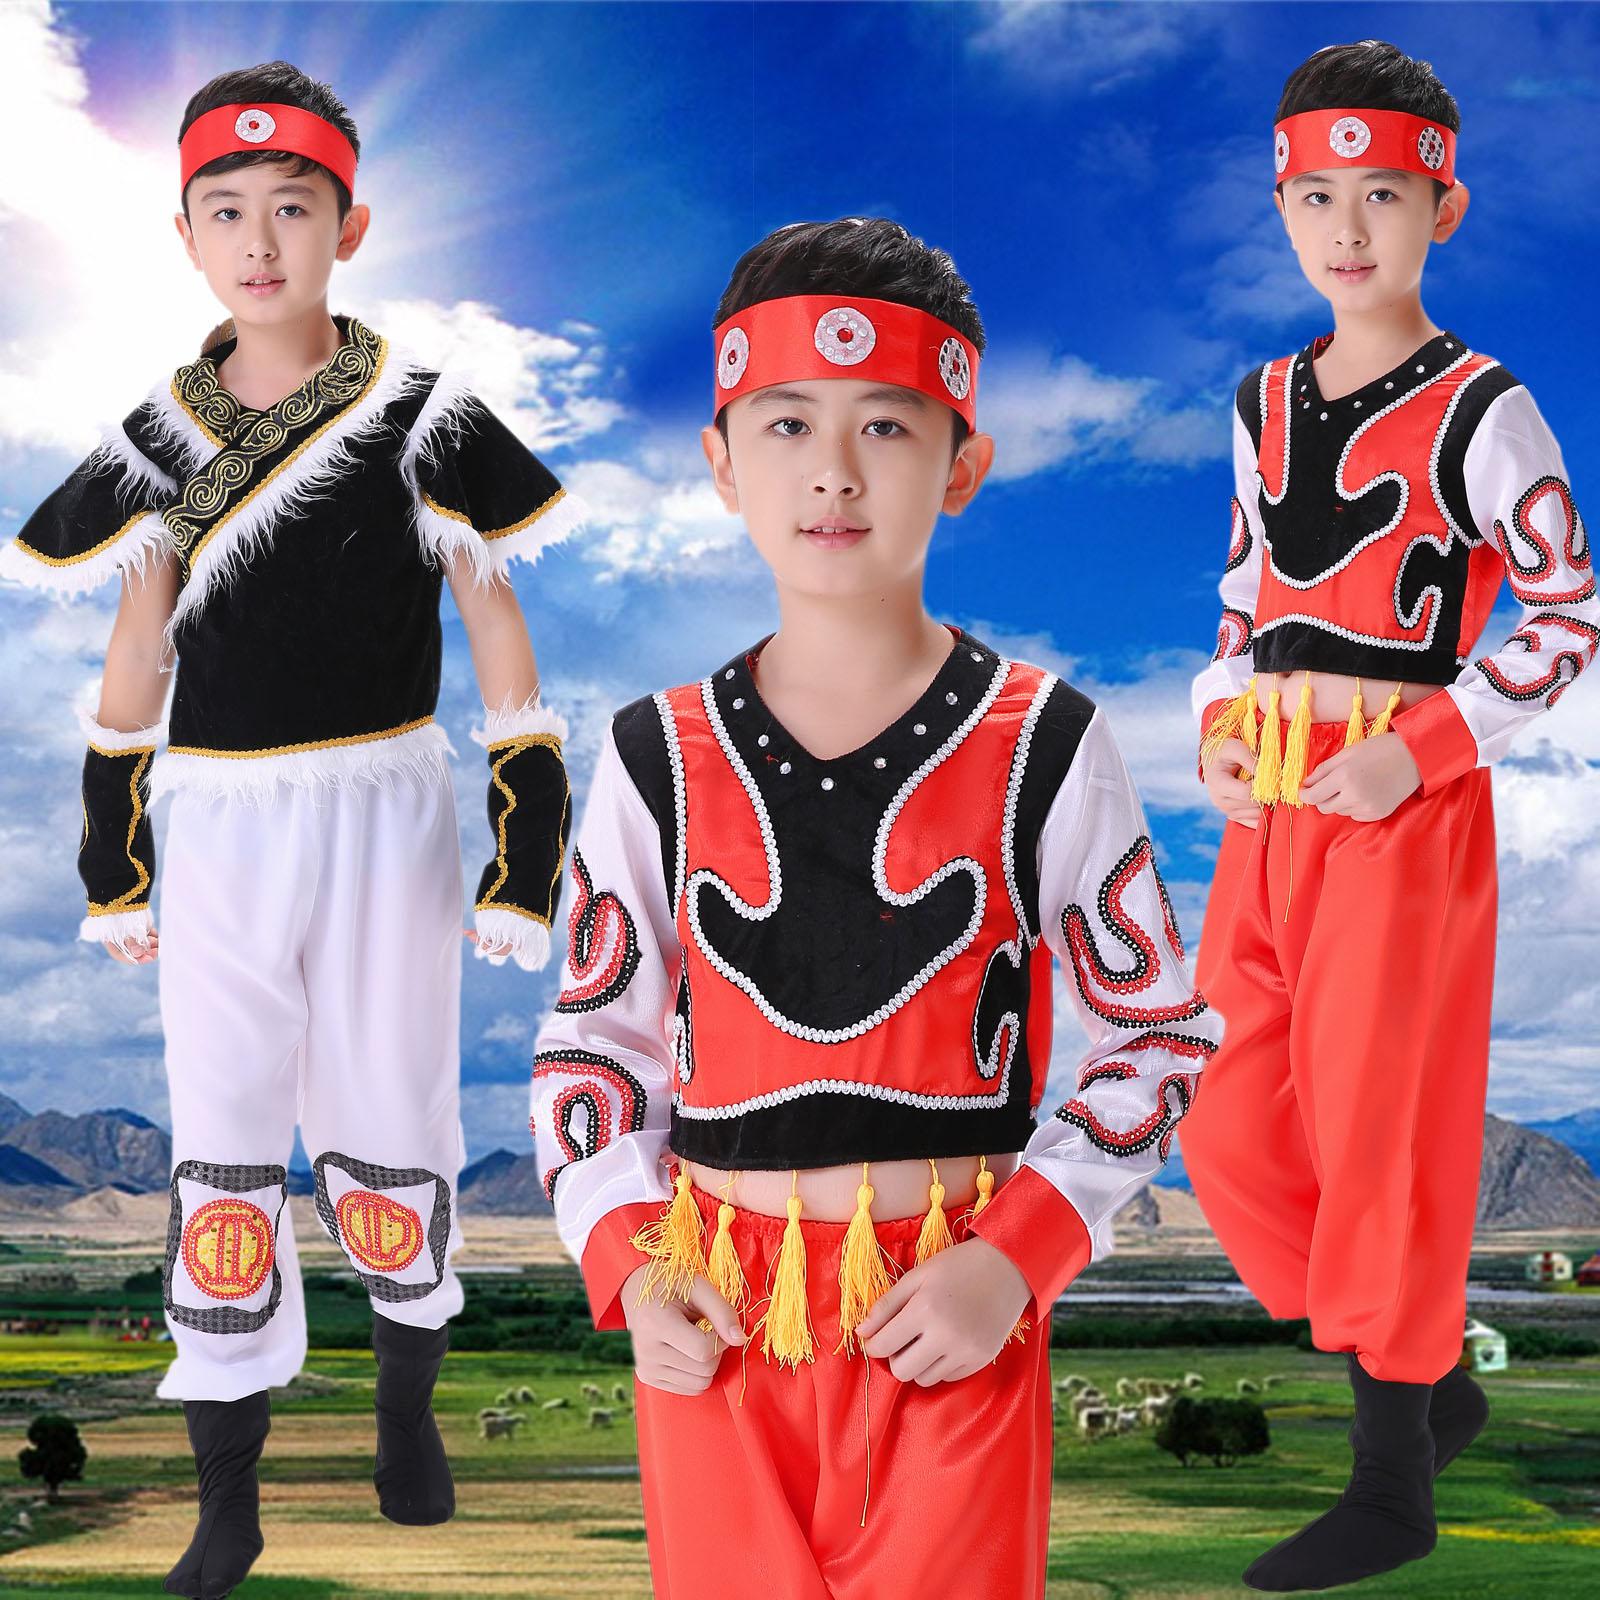 Child Mongolia Dance Costume Boy Tibetan Dance Clothing Male Miao Dance Costume on Stage Chinese Folk Costume 89  sc 1 st  Google Sites & ? ??Child Mongolia Dance Costume Boy Tibetan Dance Clothing Male ...